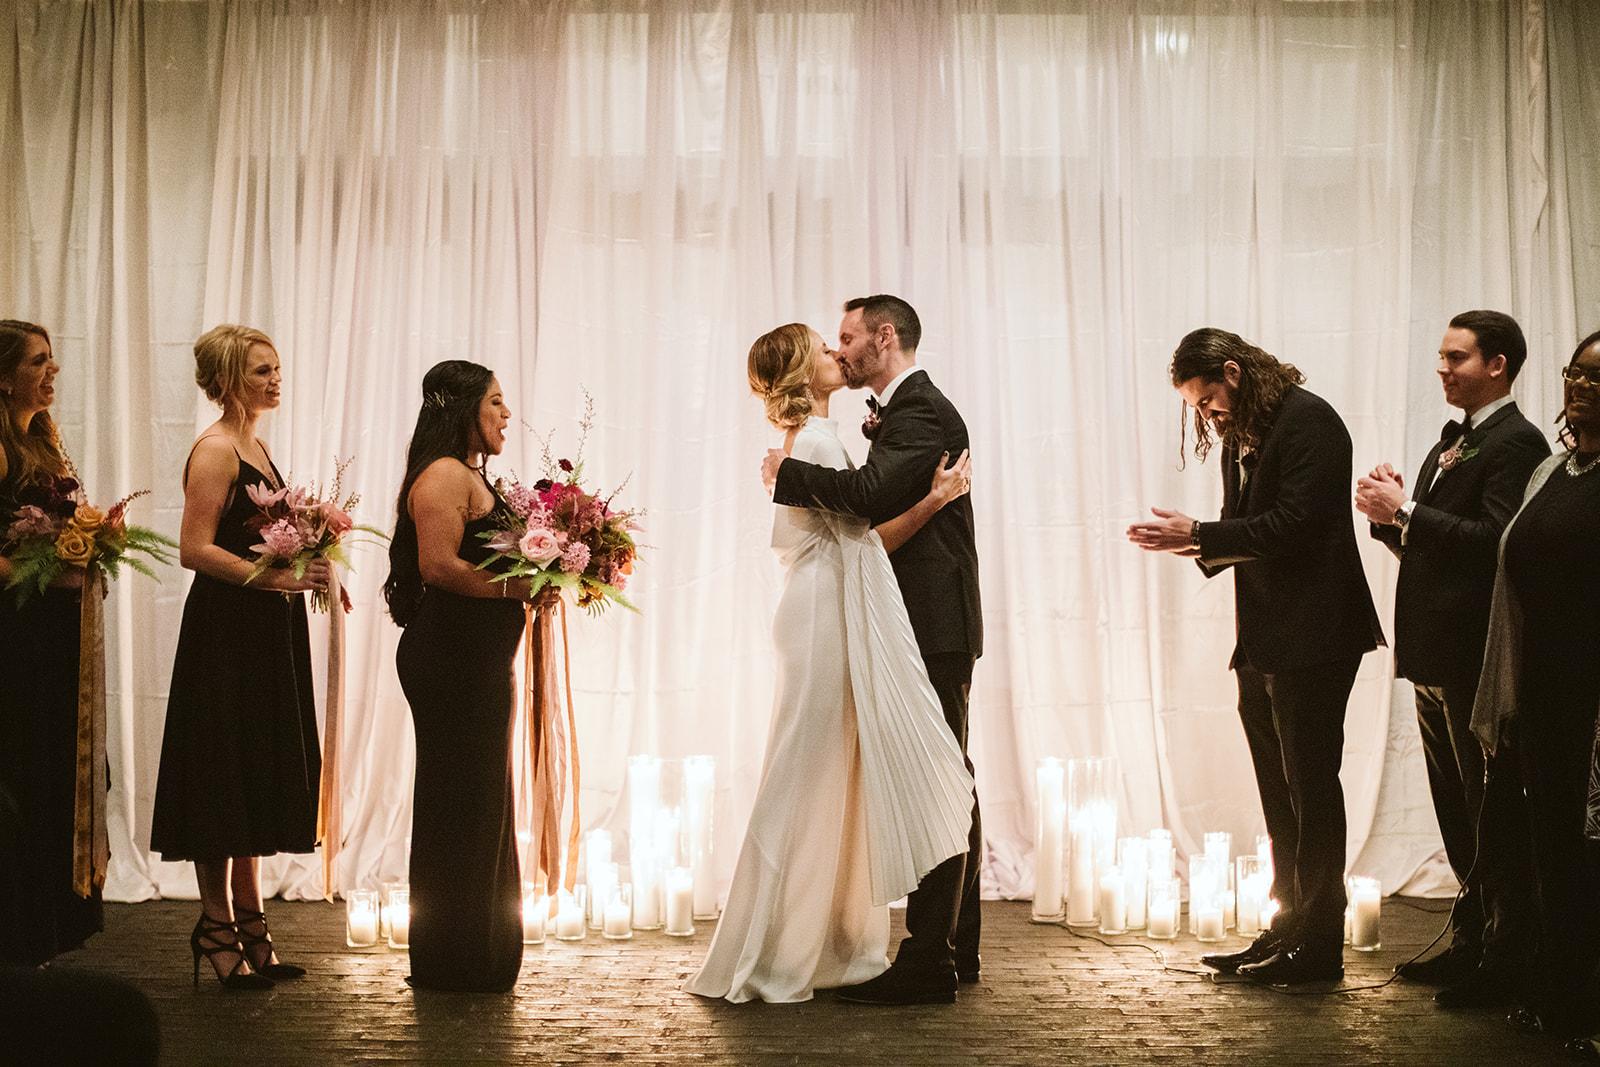 sean_shannon_wedding-603_websize.jpg